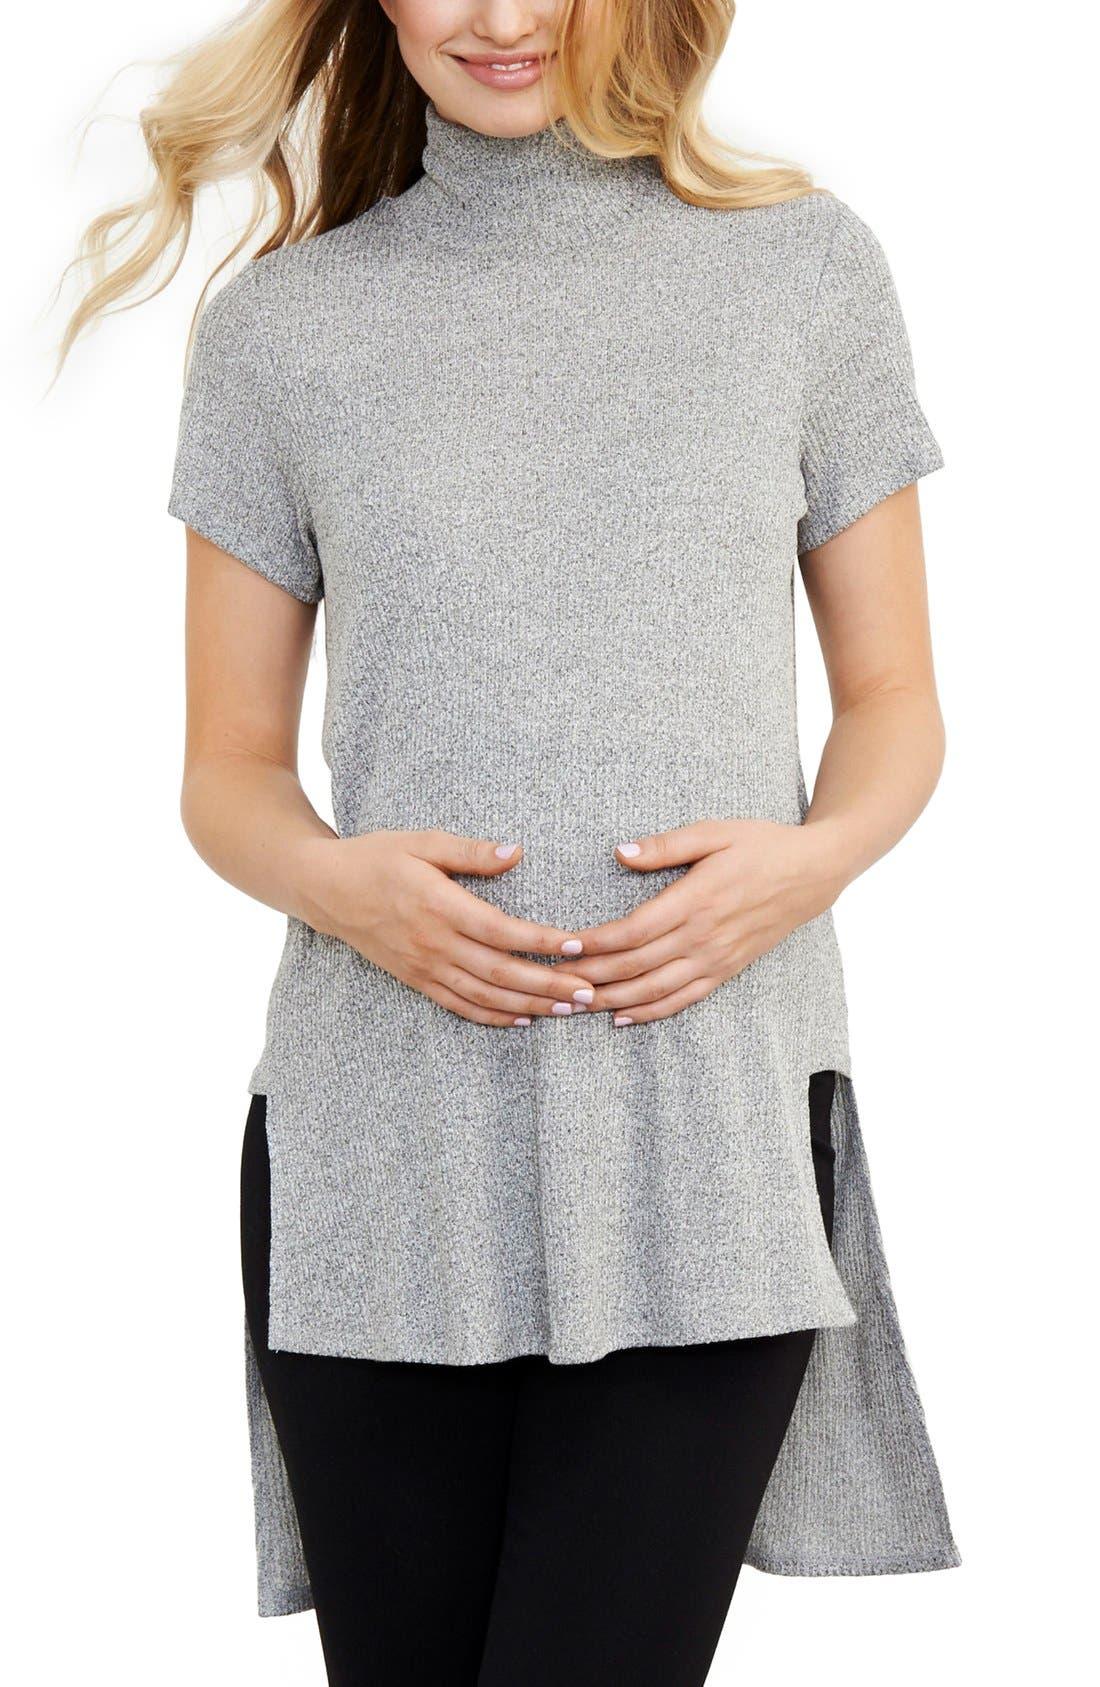 MATERNAL AMERICA Turtleneck High/Low Maternity Top, Main, color, 020